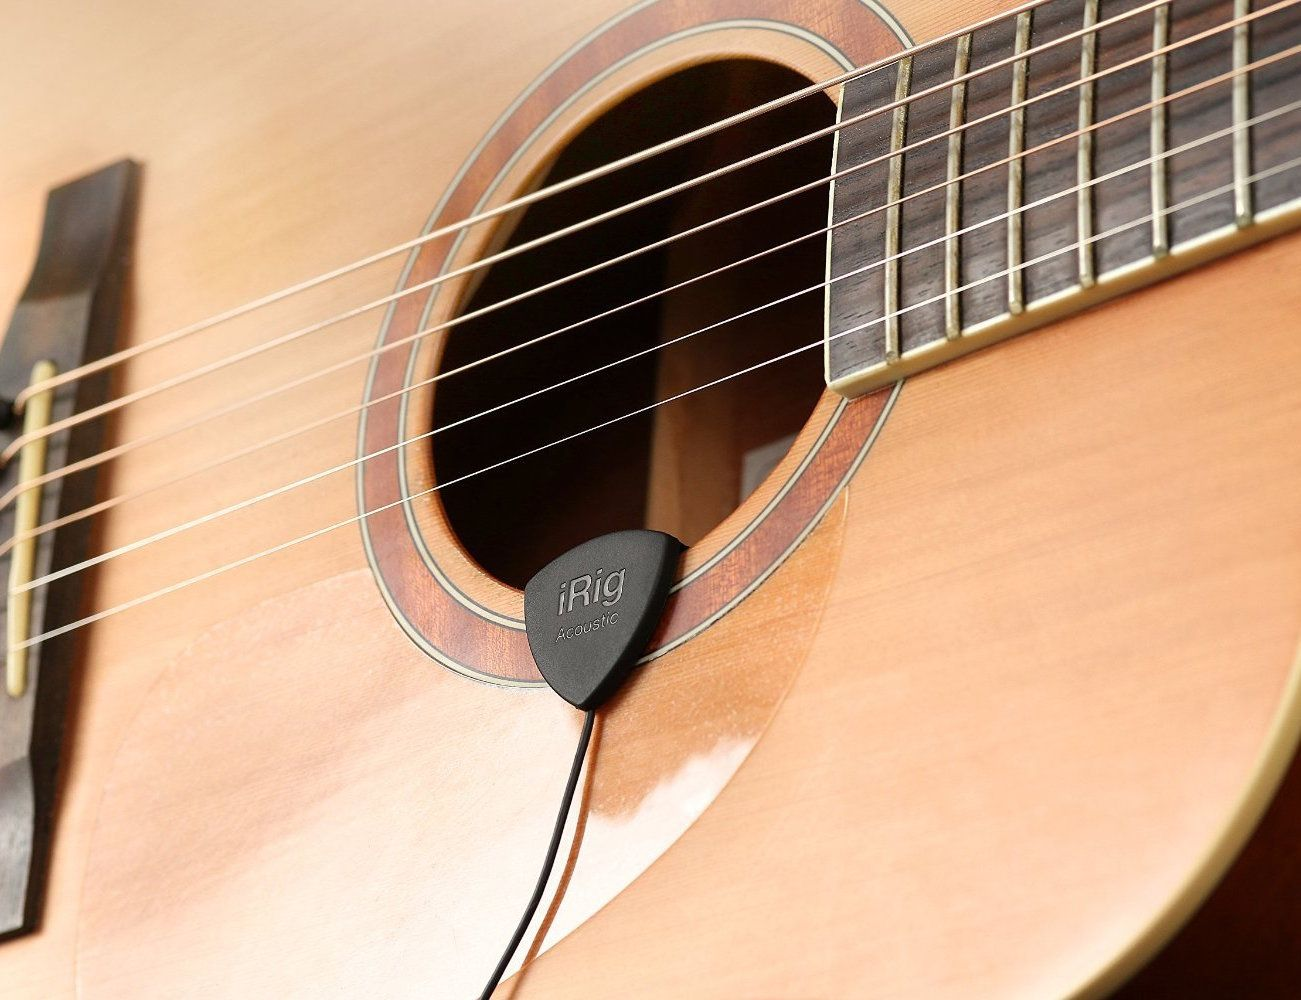 Irig Acoustic Guitar Microphone Acoustic Instrument Acoustic Guitar Guitar